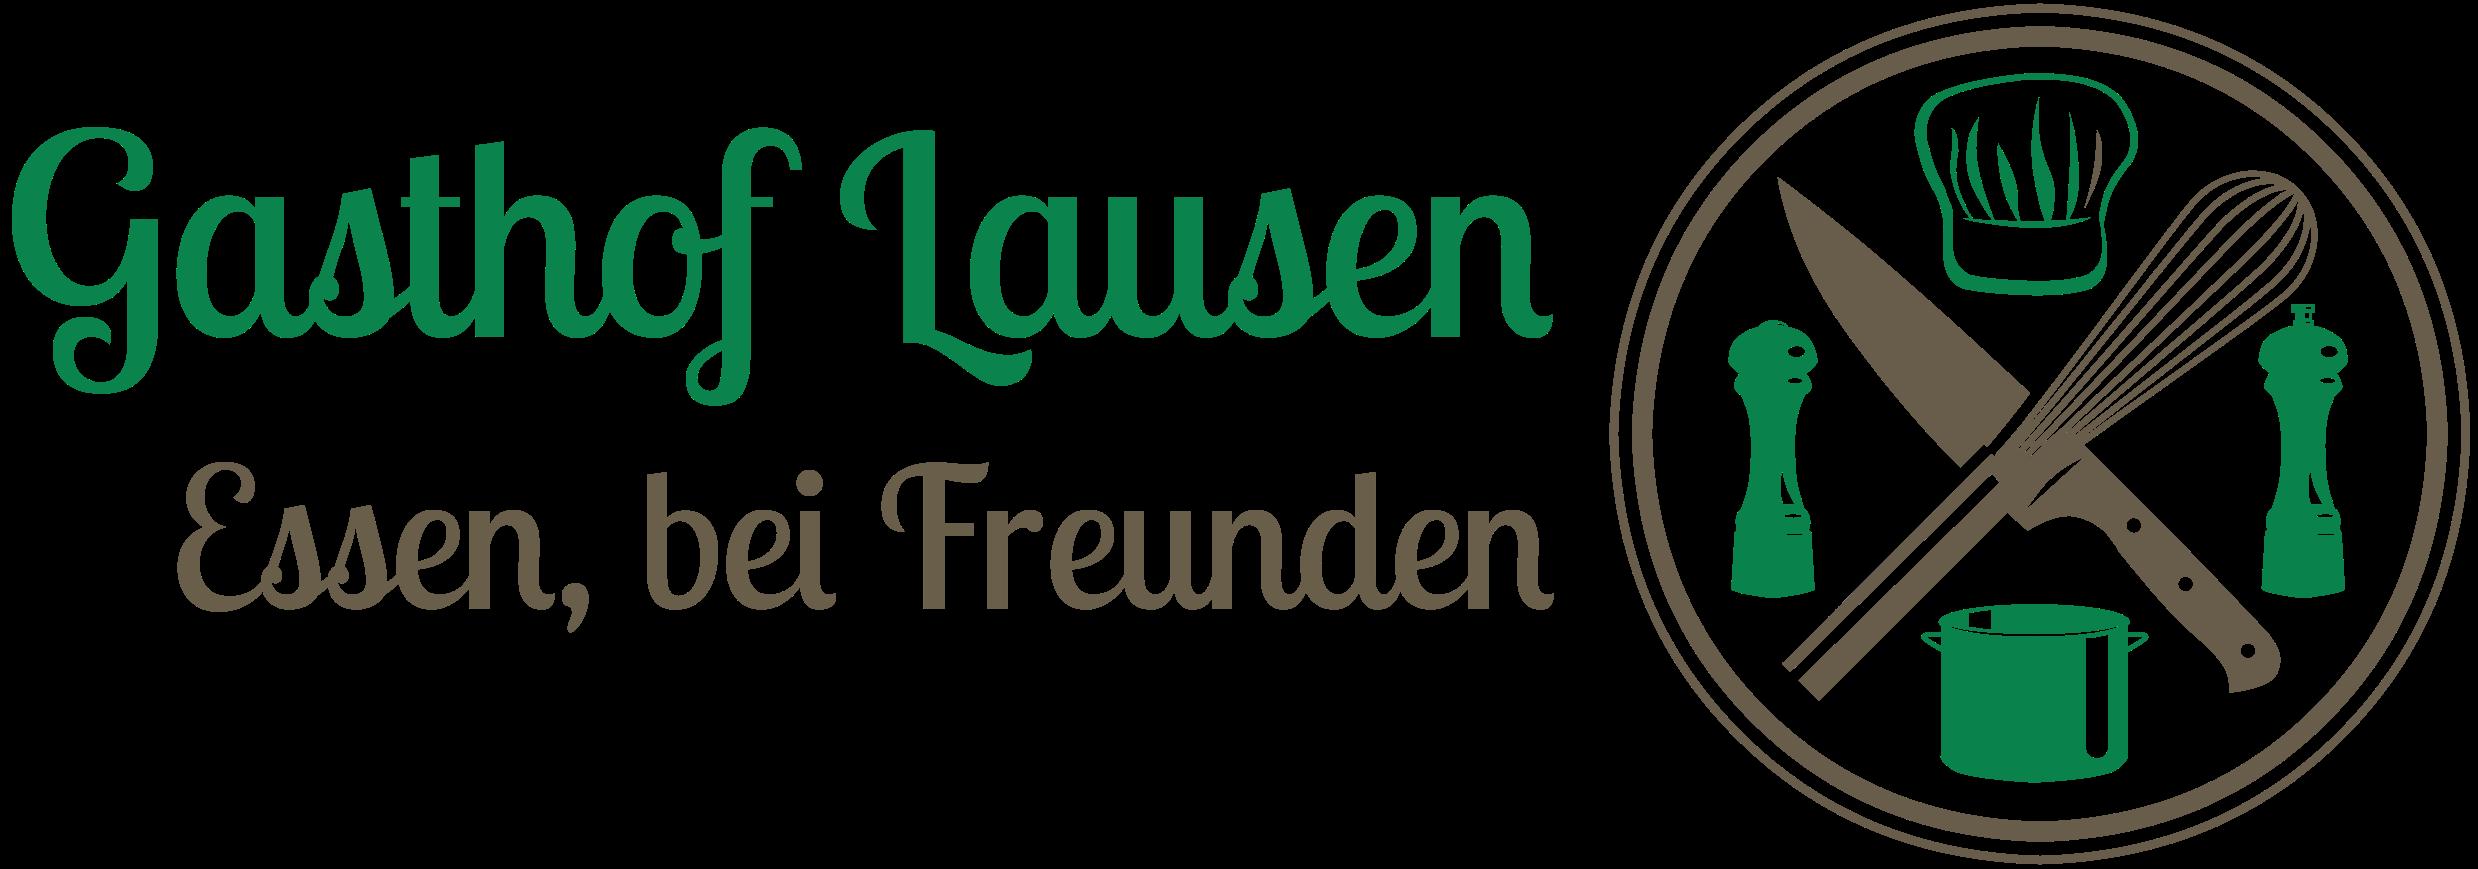 Gasthof Lausen